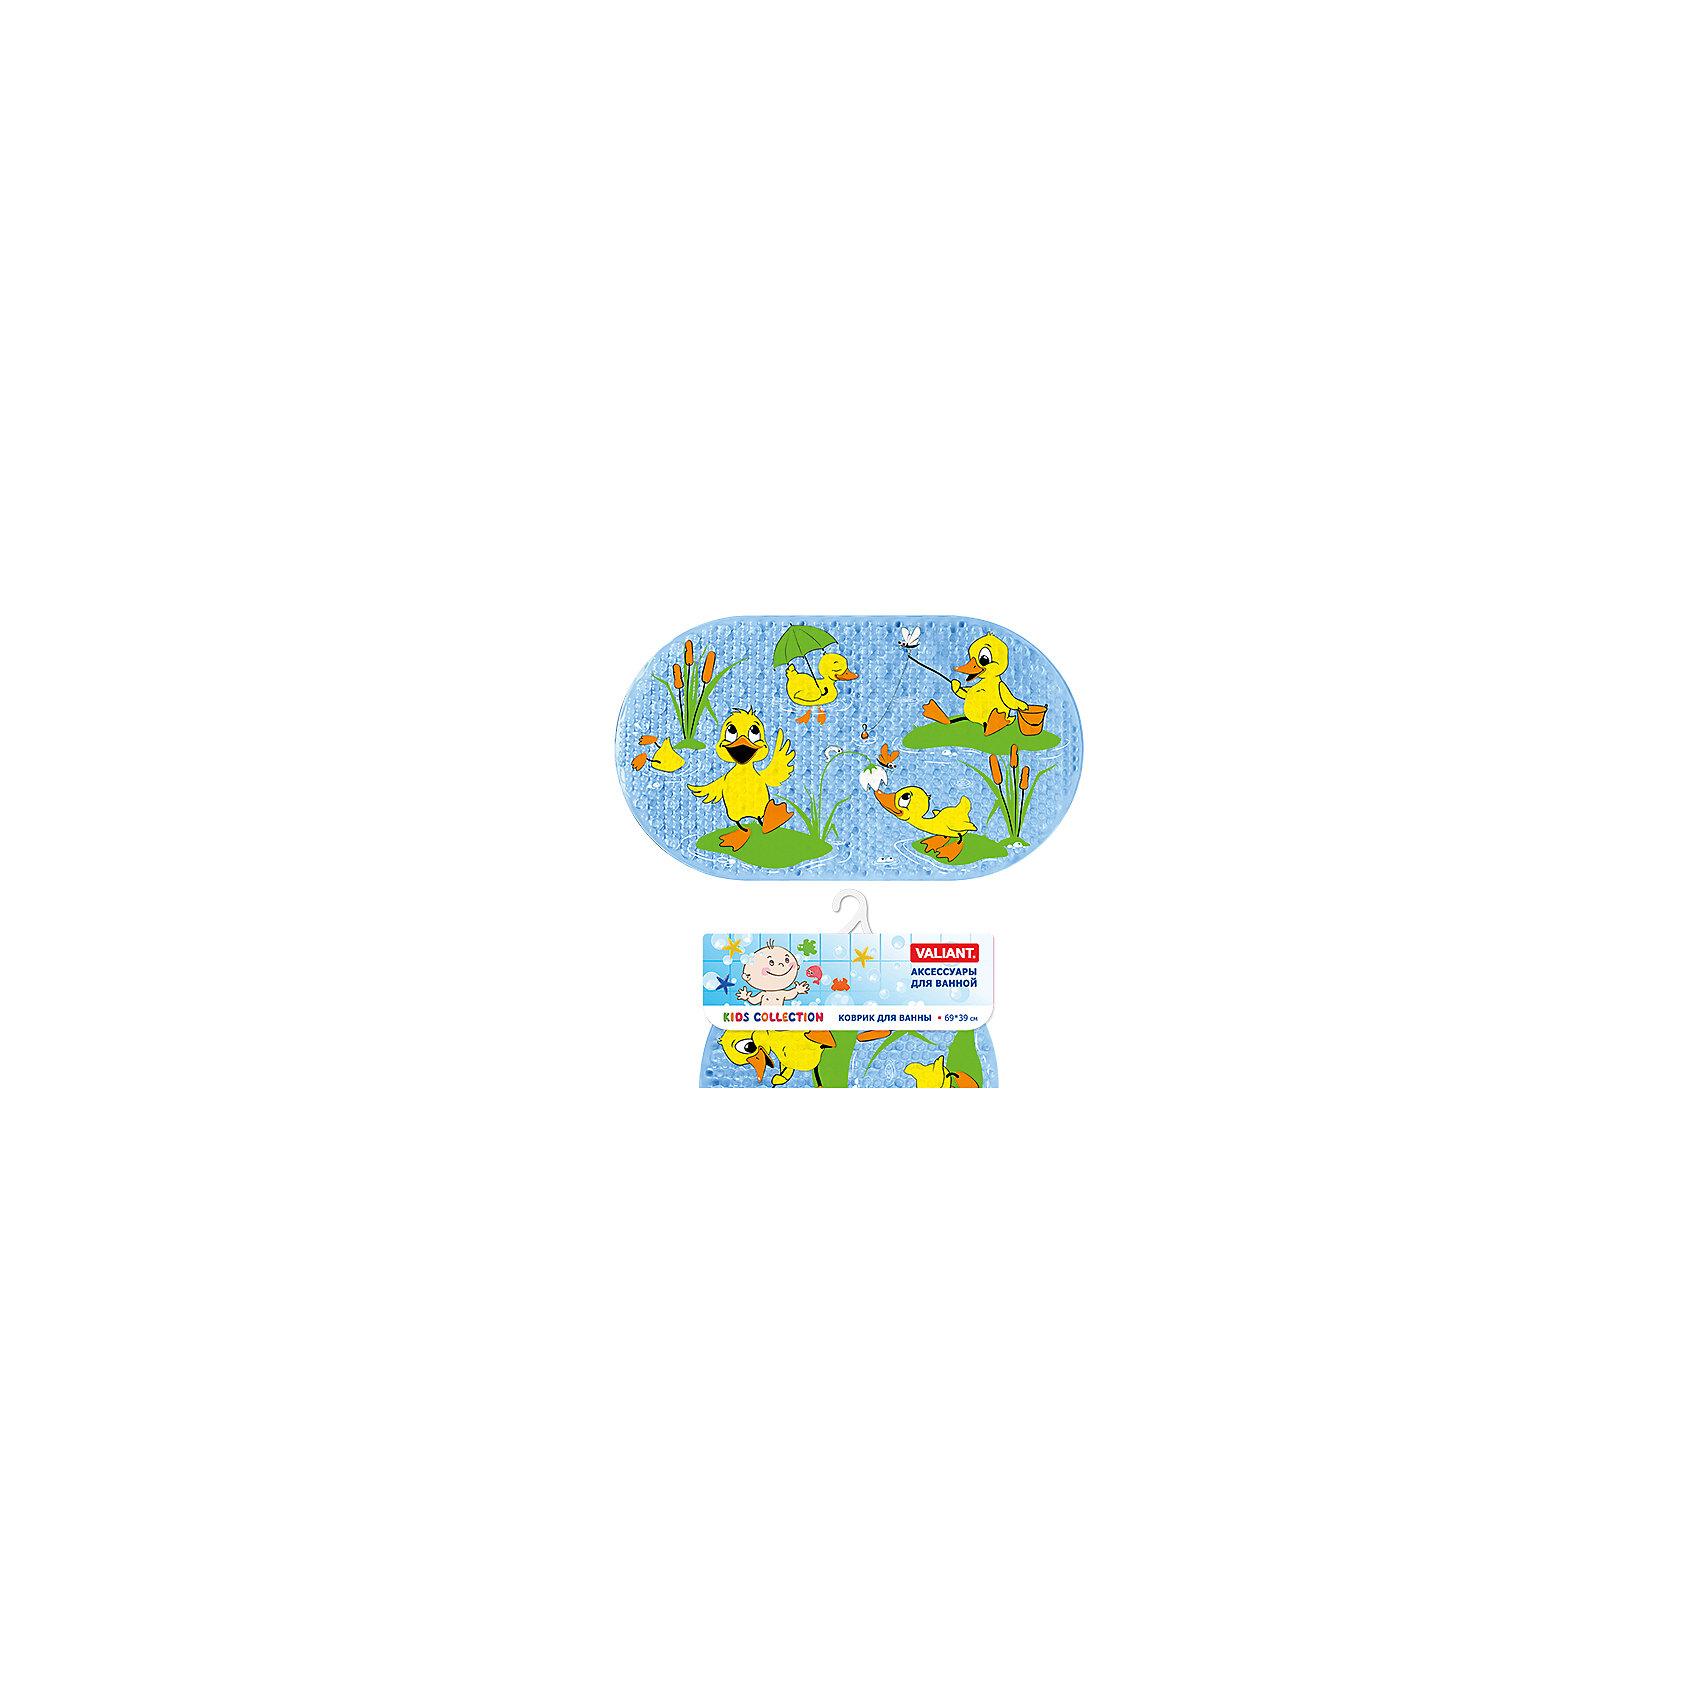 VALIANT Коврик для ванны Утята 69*39 см набор для ванной playgo утята 2430